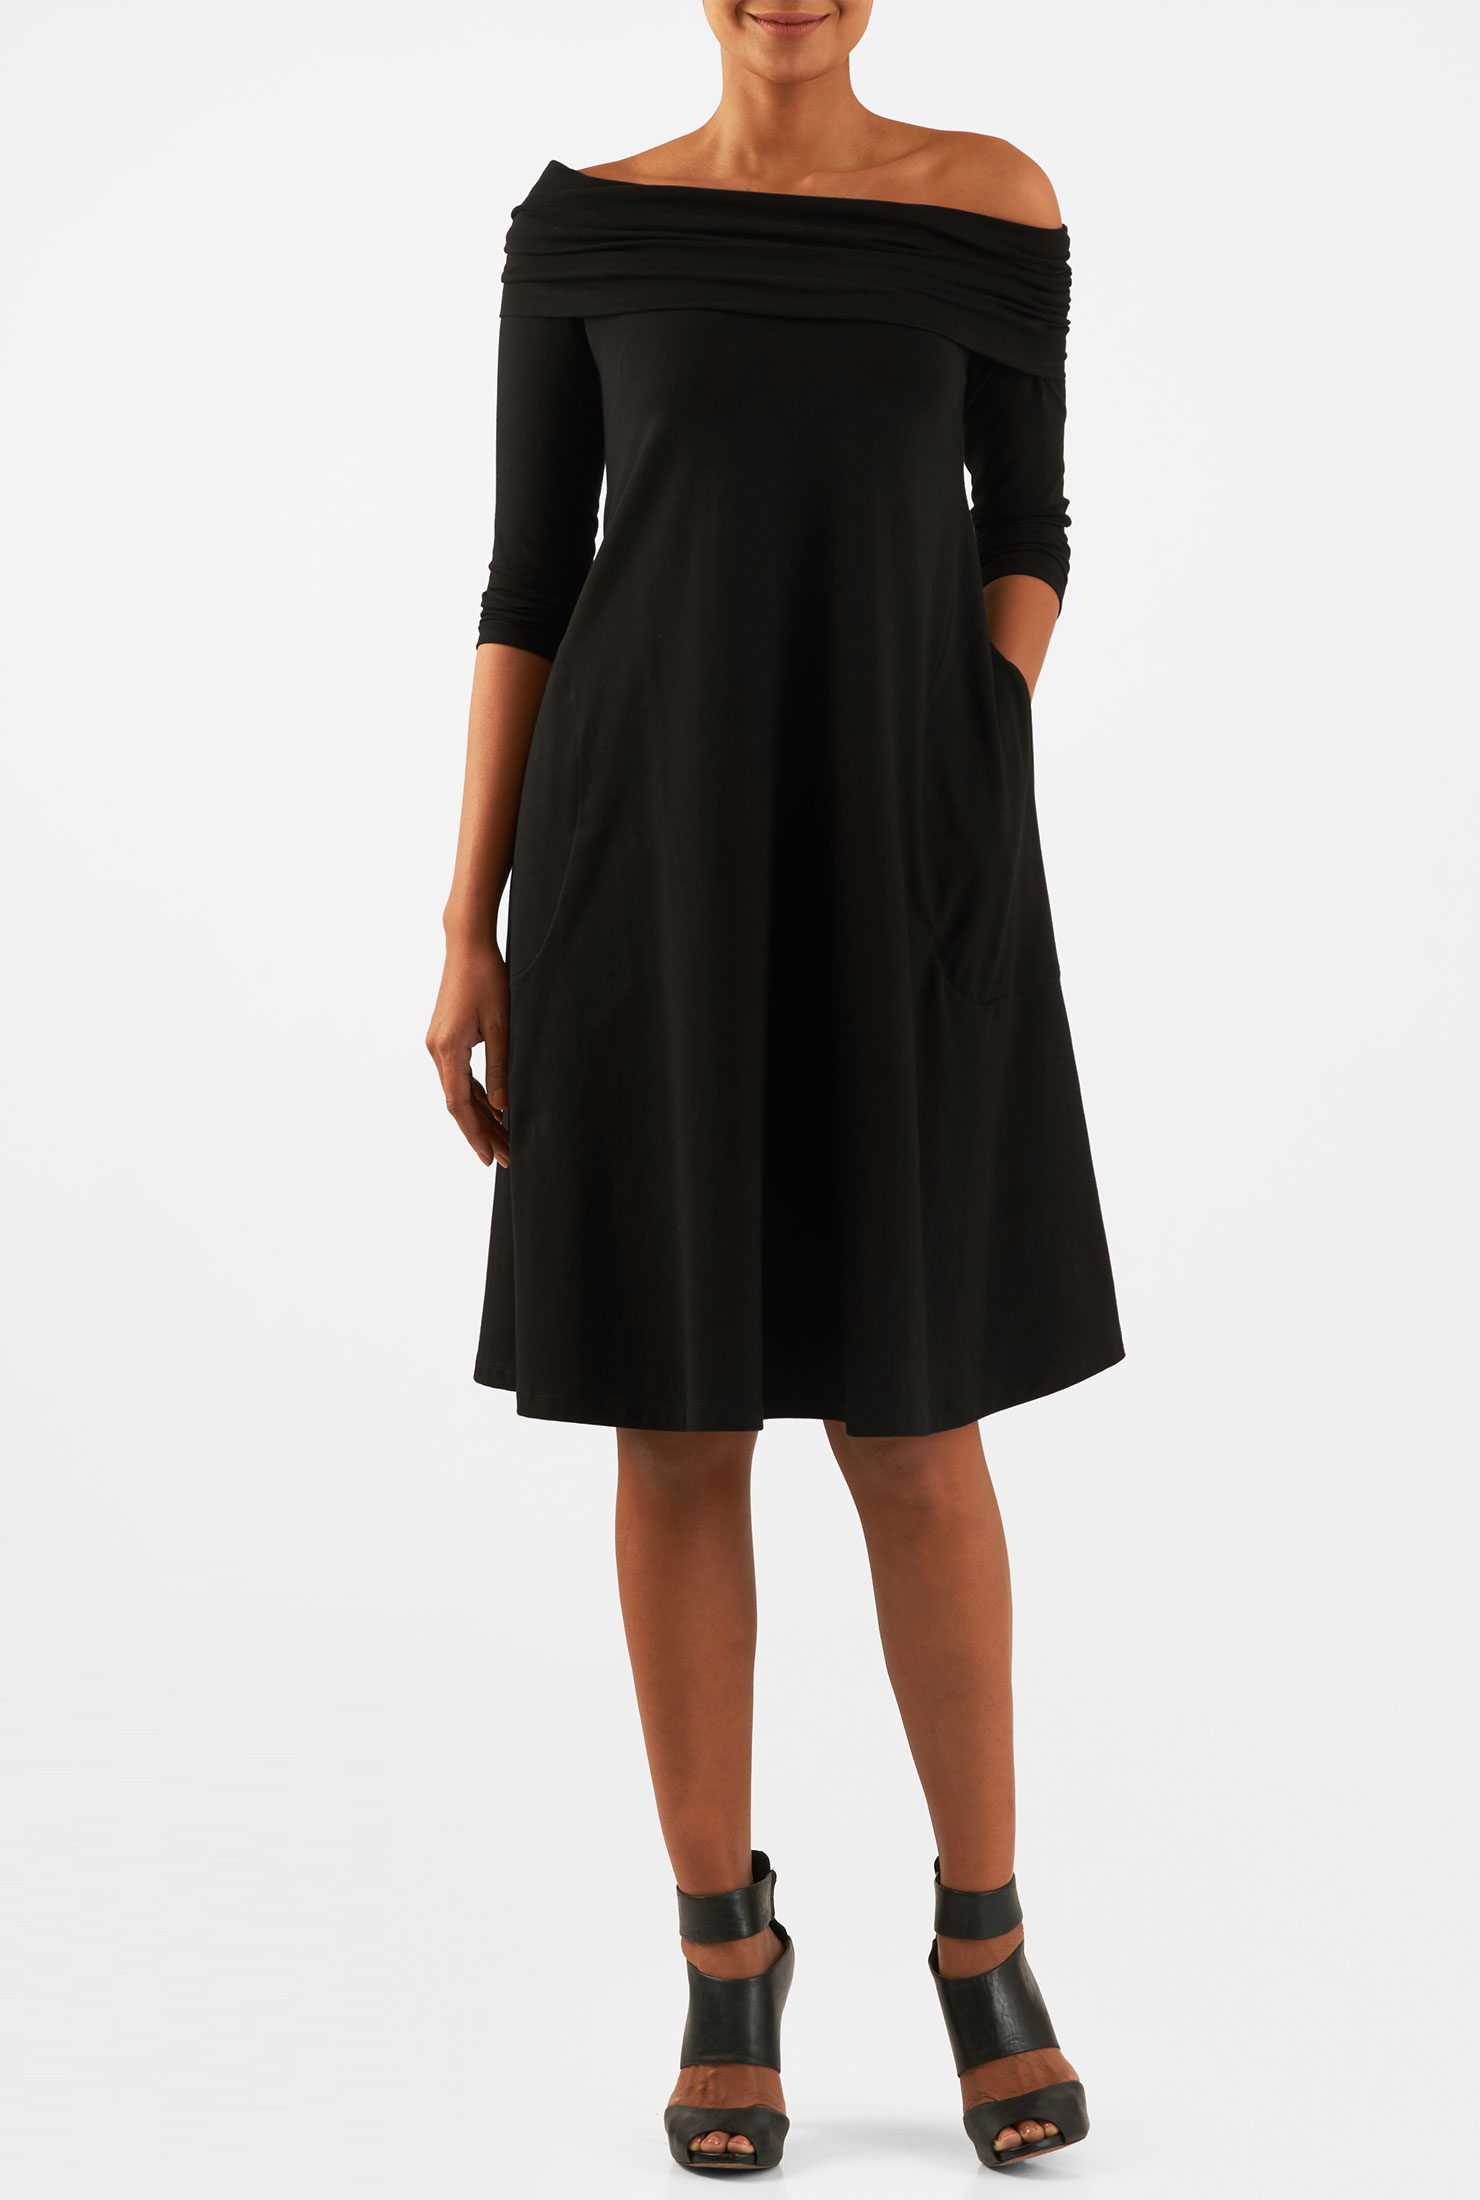 4f73b80e1b eShakti Women s Off-shoulder cotton knit shift dress -  54.95